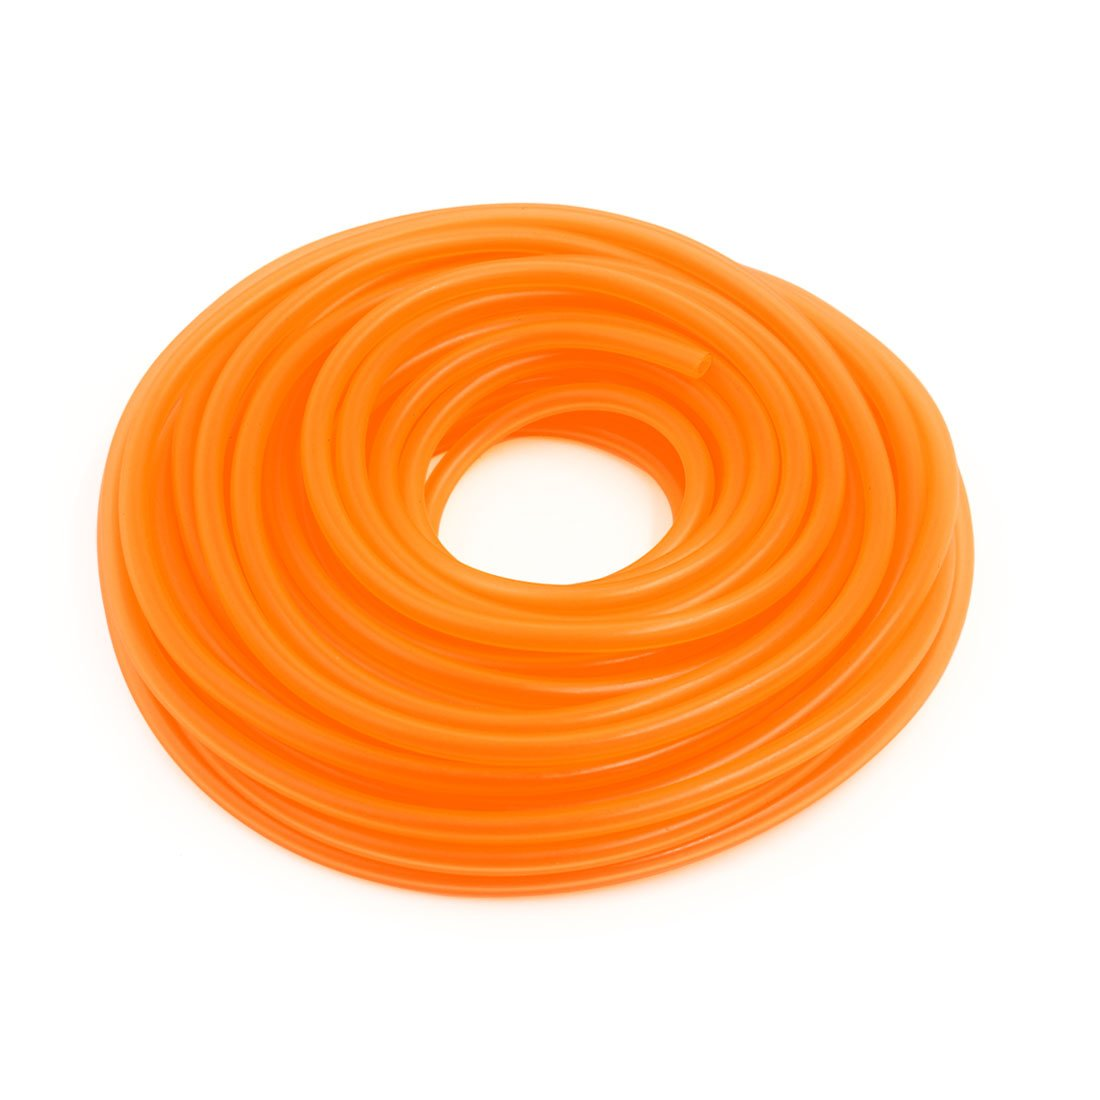 sourcing map Longueur 18M Silicone Orange tube flex combustible vide tube 4x8mm pour Voiture a16073000ux1468